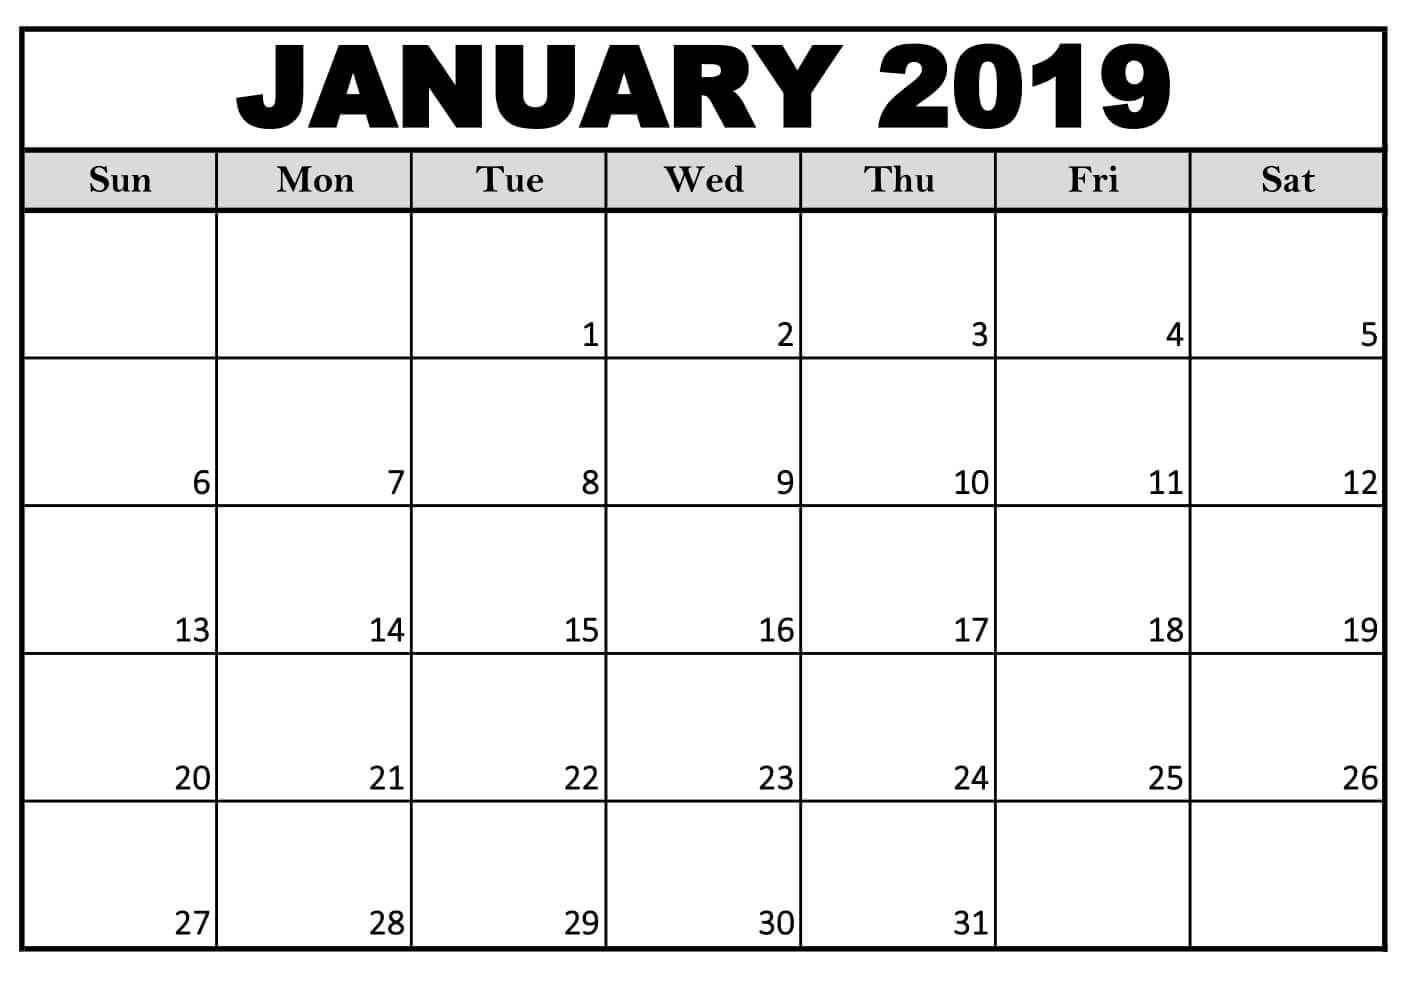 January Calendar Free Printable For Office